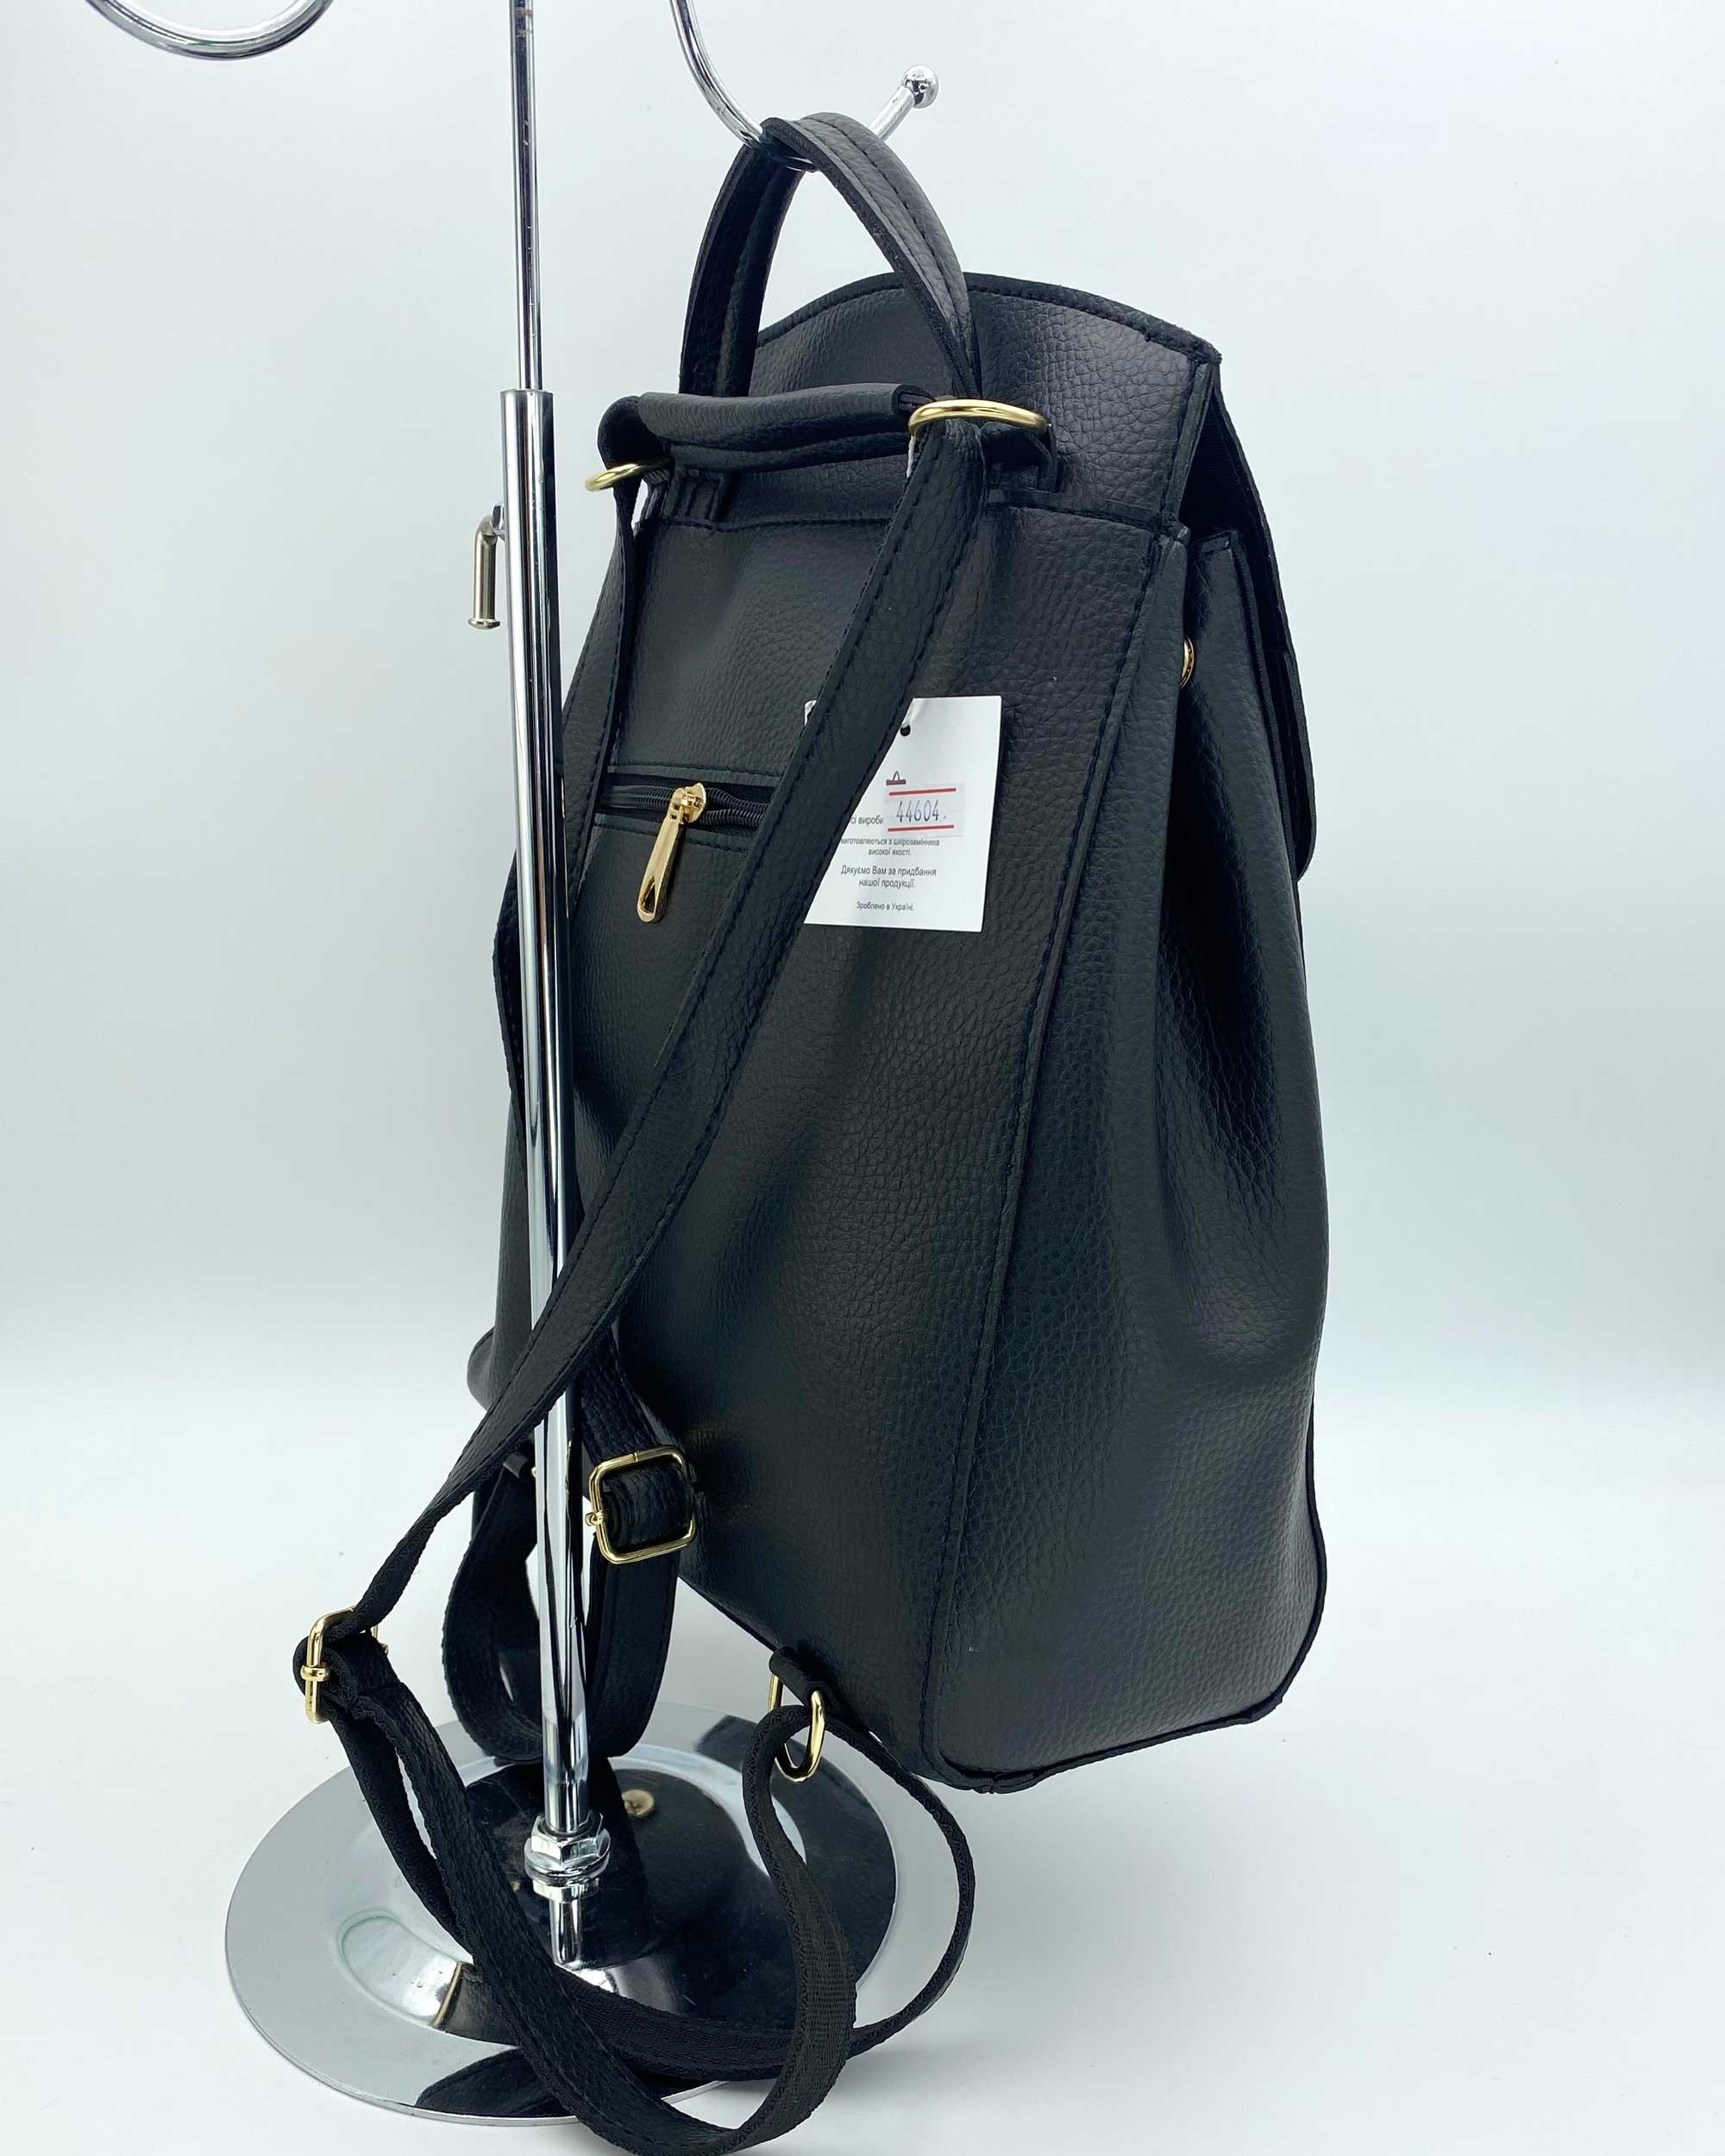 5b5a616eb70e Молодежный сумка-рюкзак Сердце черного цвета оптом арт.44604 | WeLassie